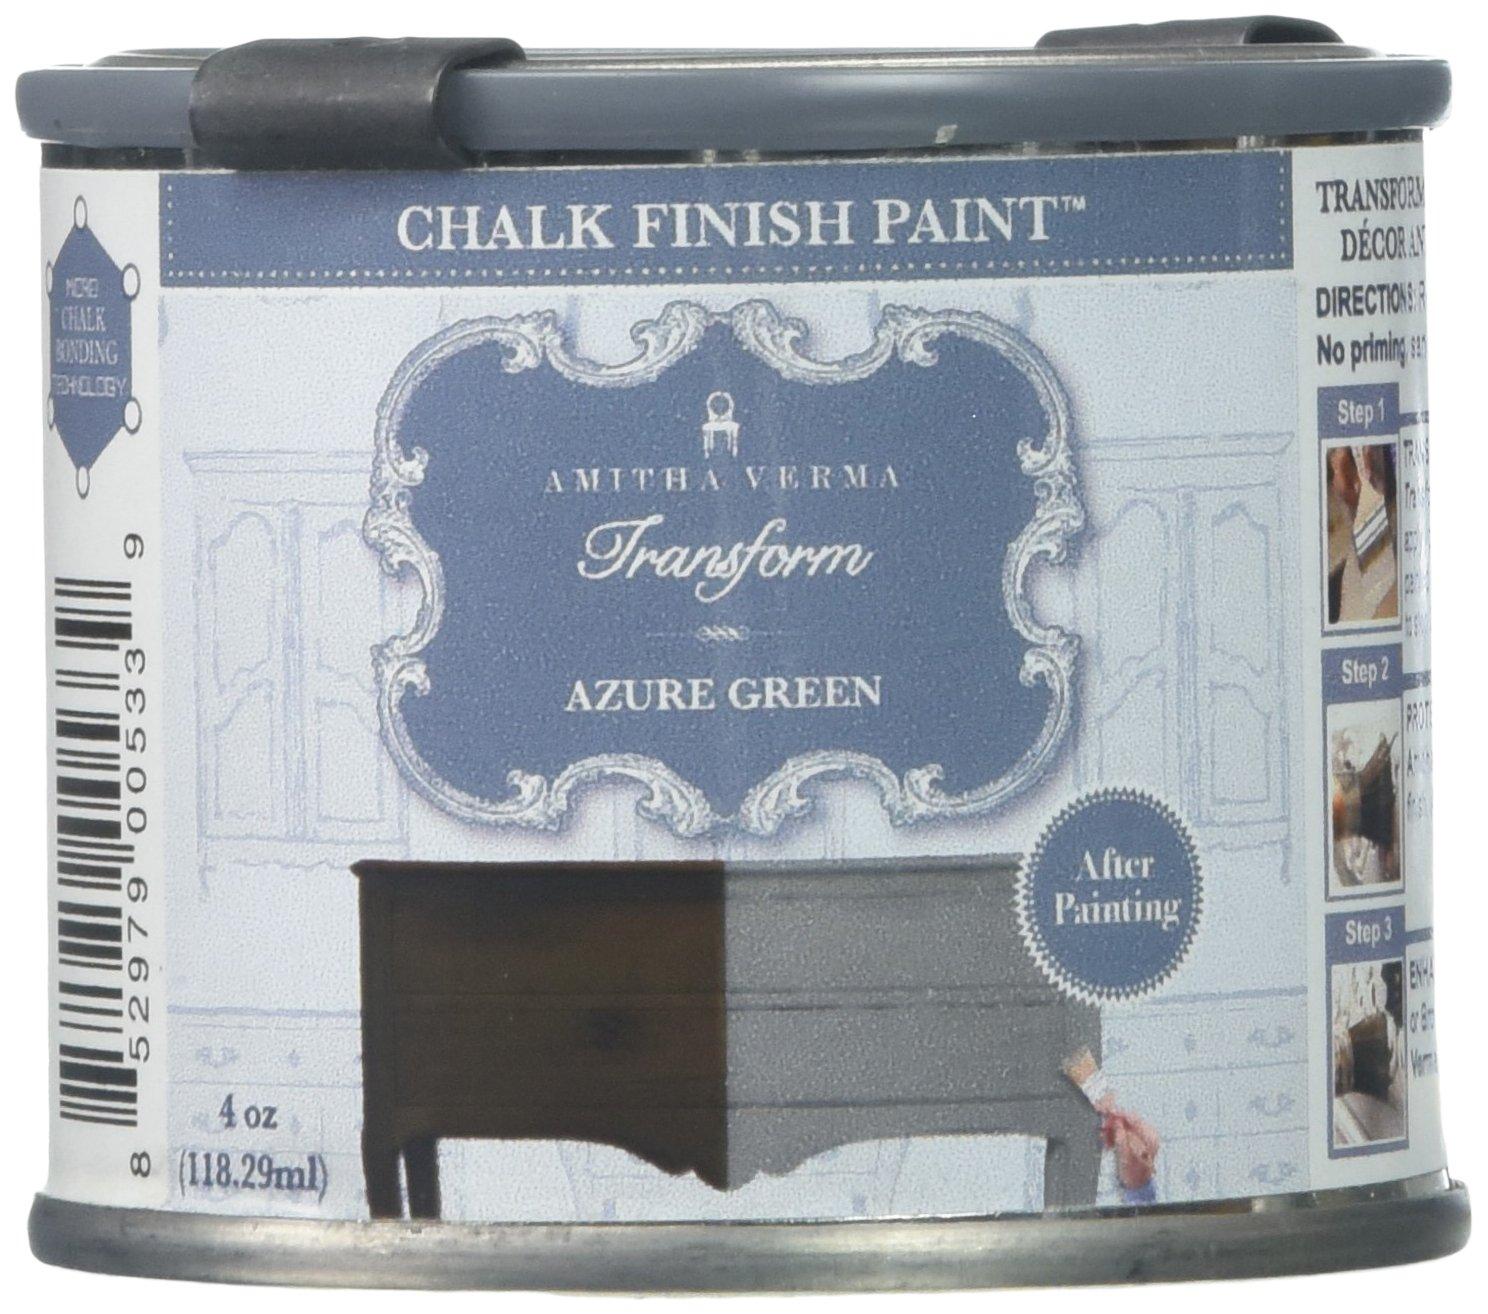 Amitha Verma Chalk Finish Paint, No Prep, One Coat, Fast Drying ...